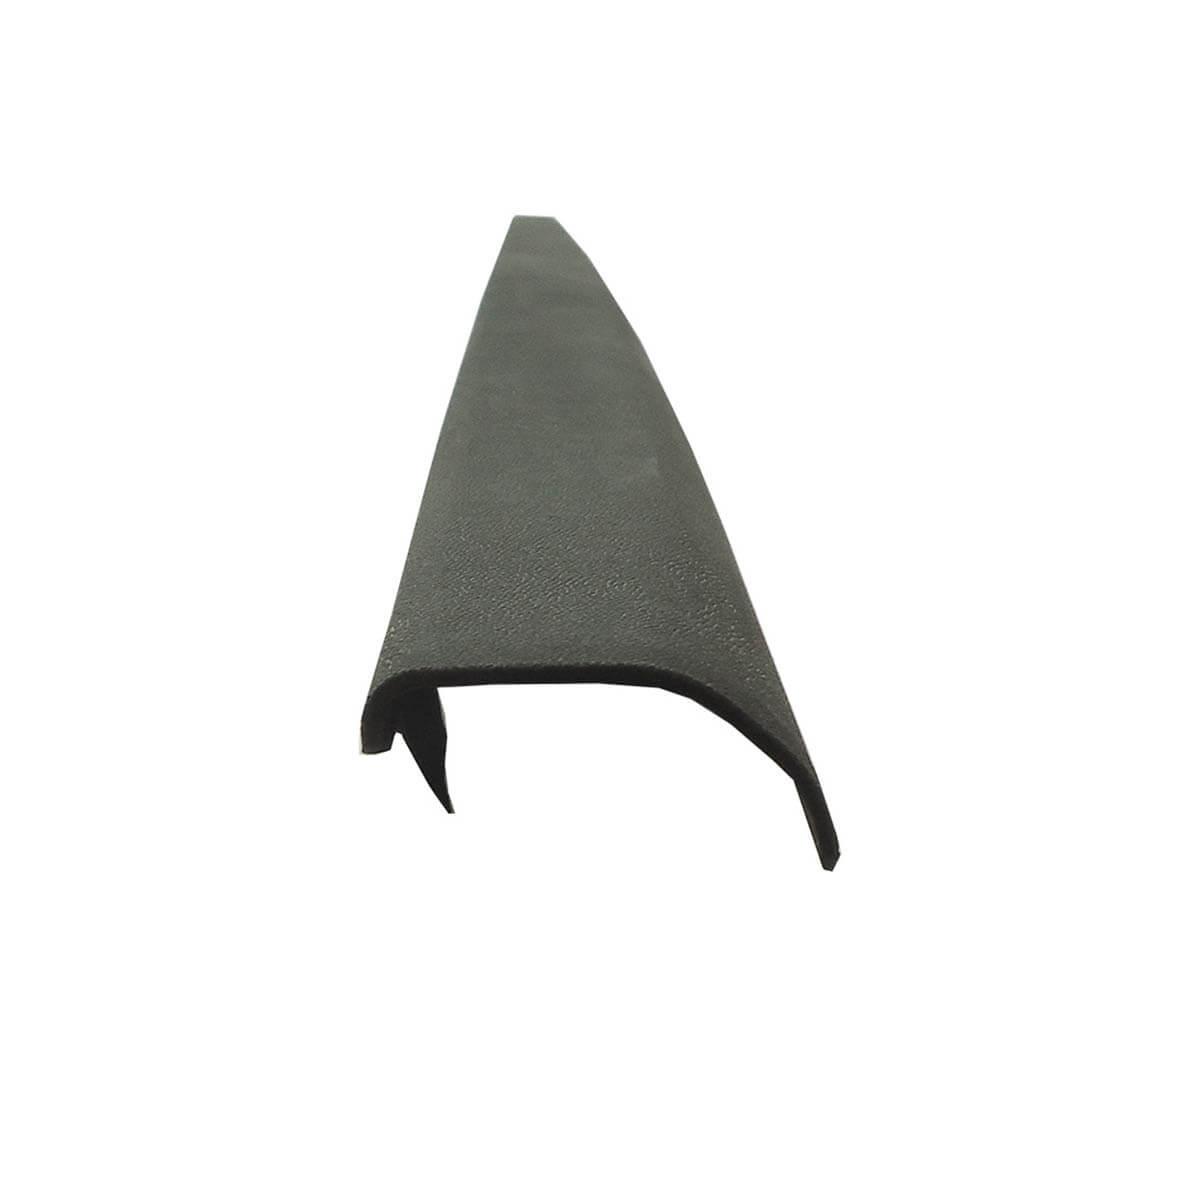 Protetor borda tampa caçamba Bepo Nova Ranger 2013 a 2020